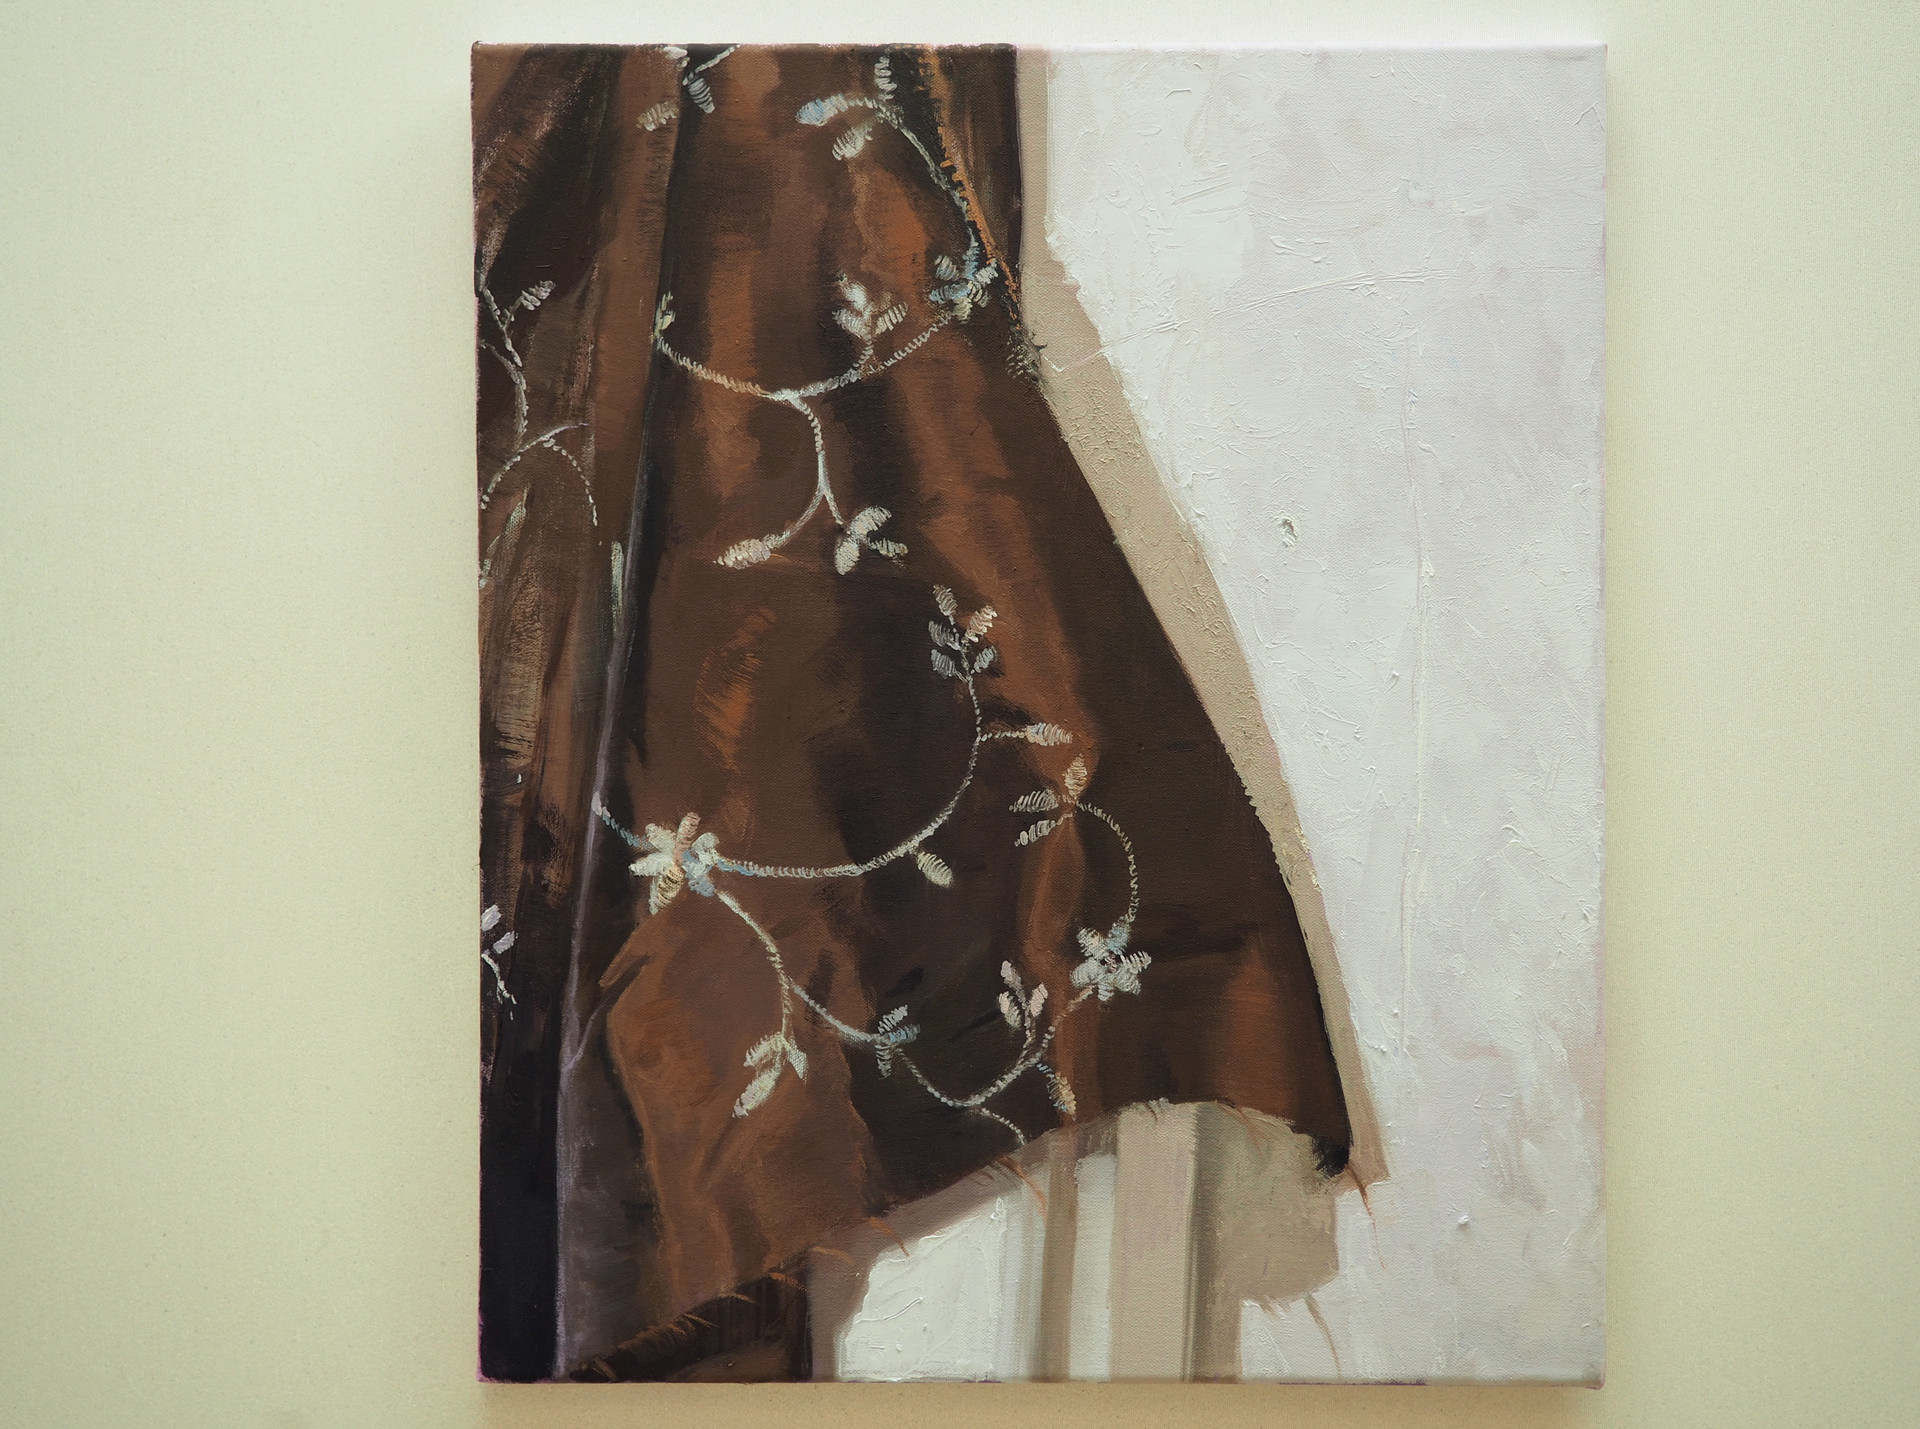 liestymä / frayed, Oil on MDF, 46 x 54 cm, 2020